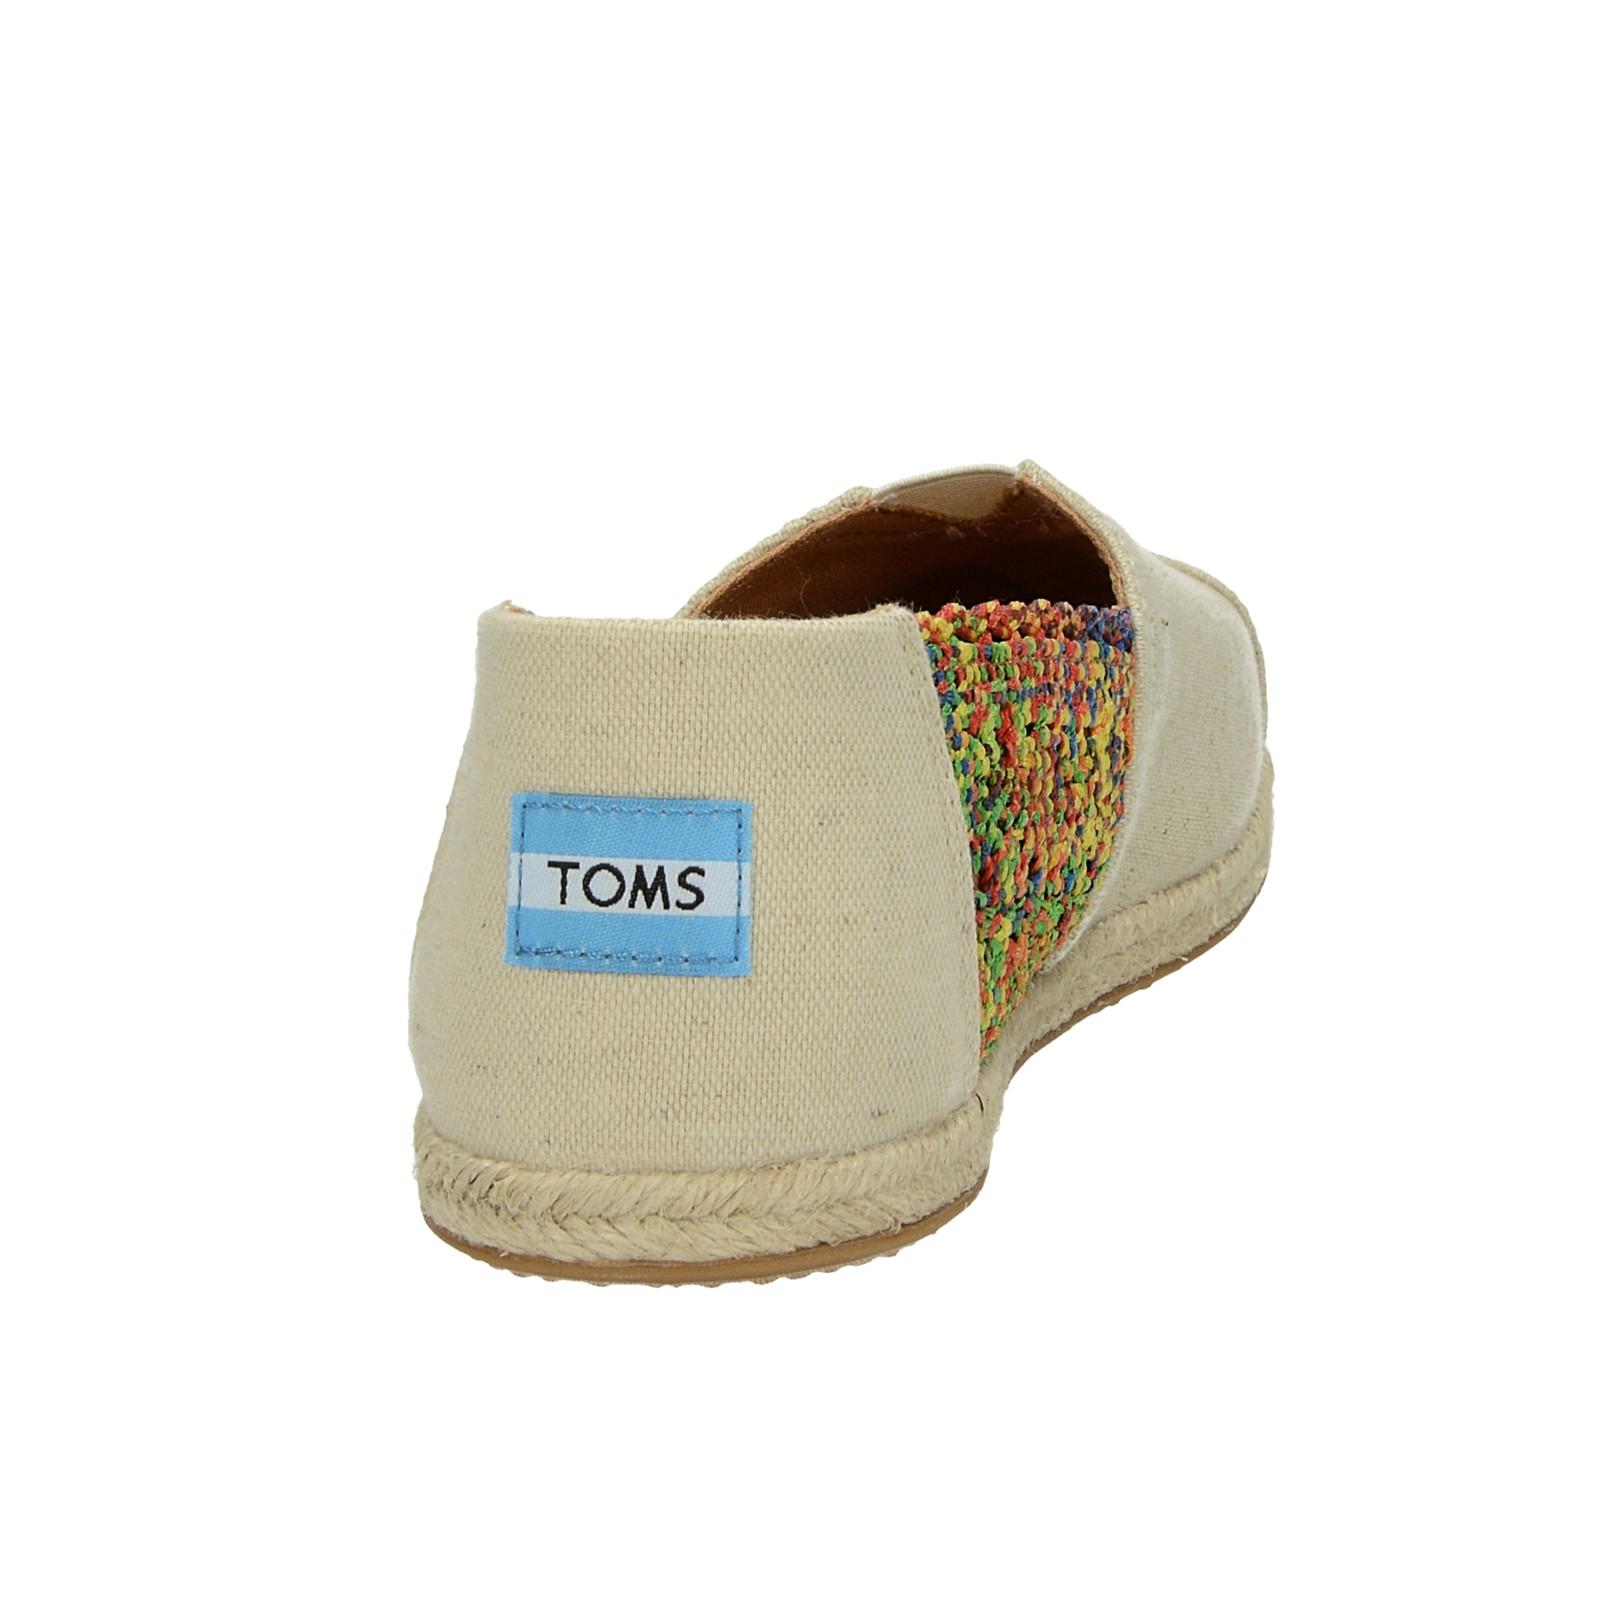 Toms dámske štýlové espadrilky - béžové